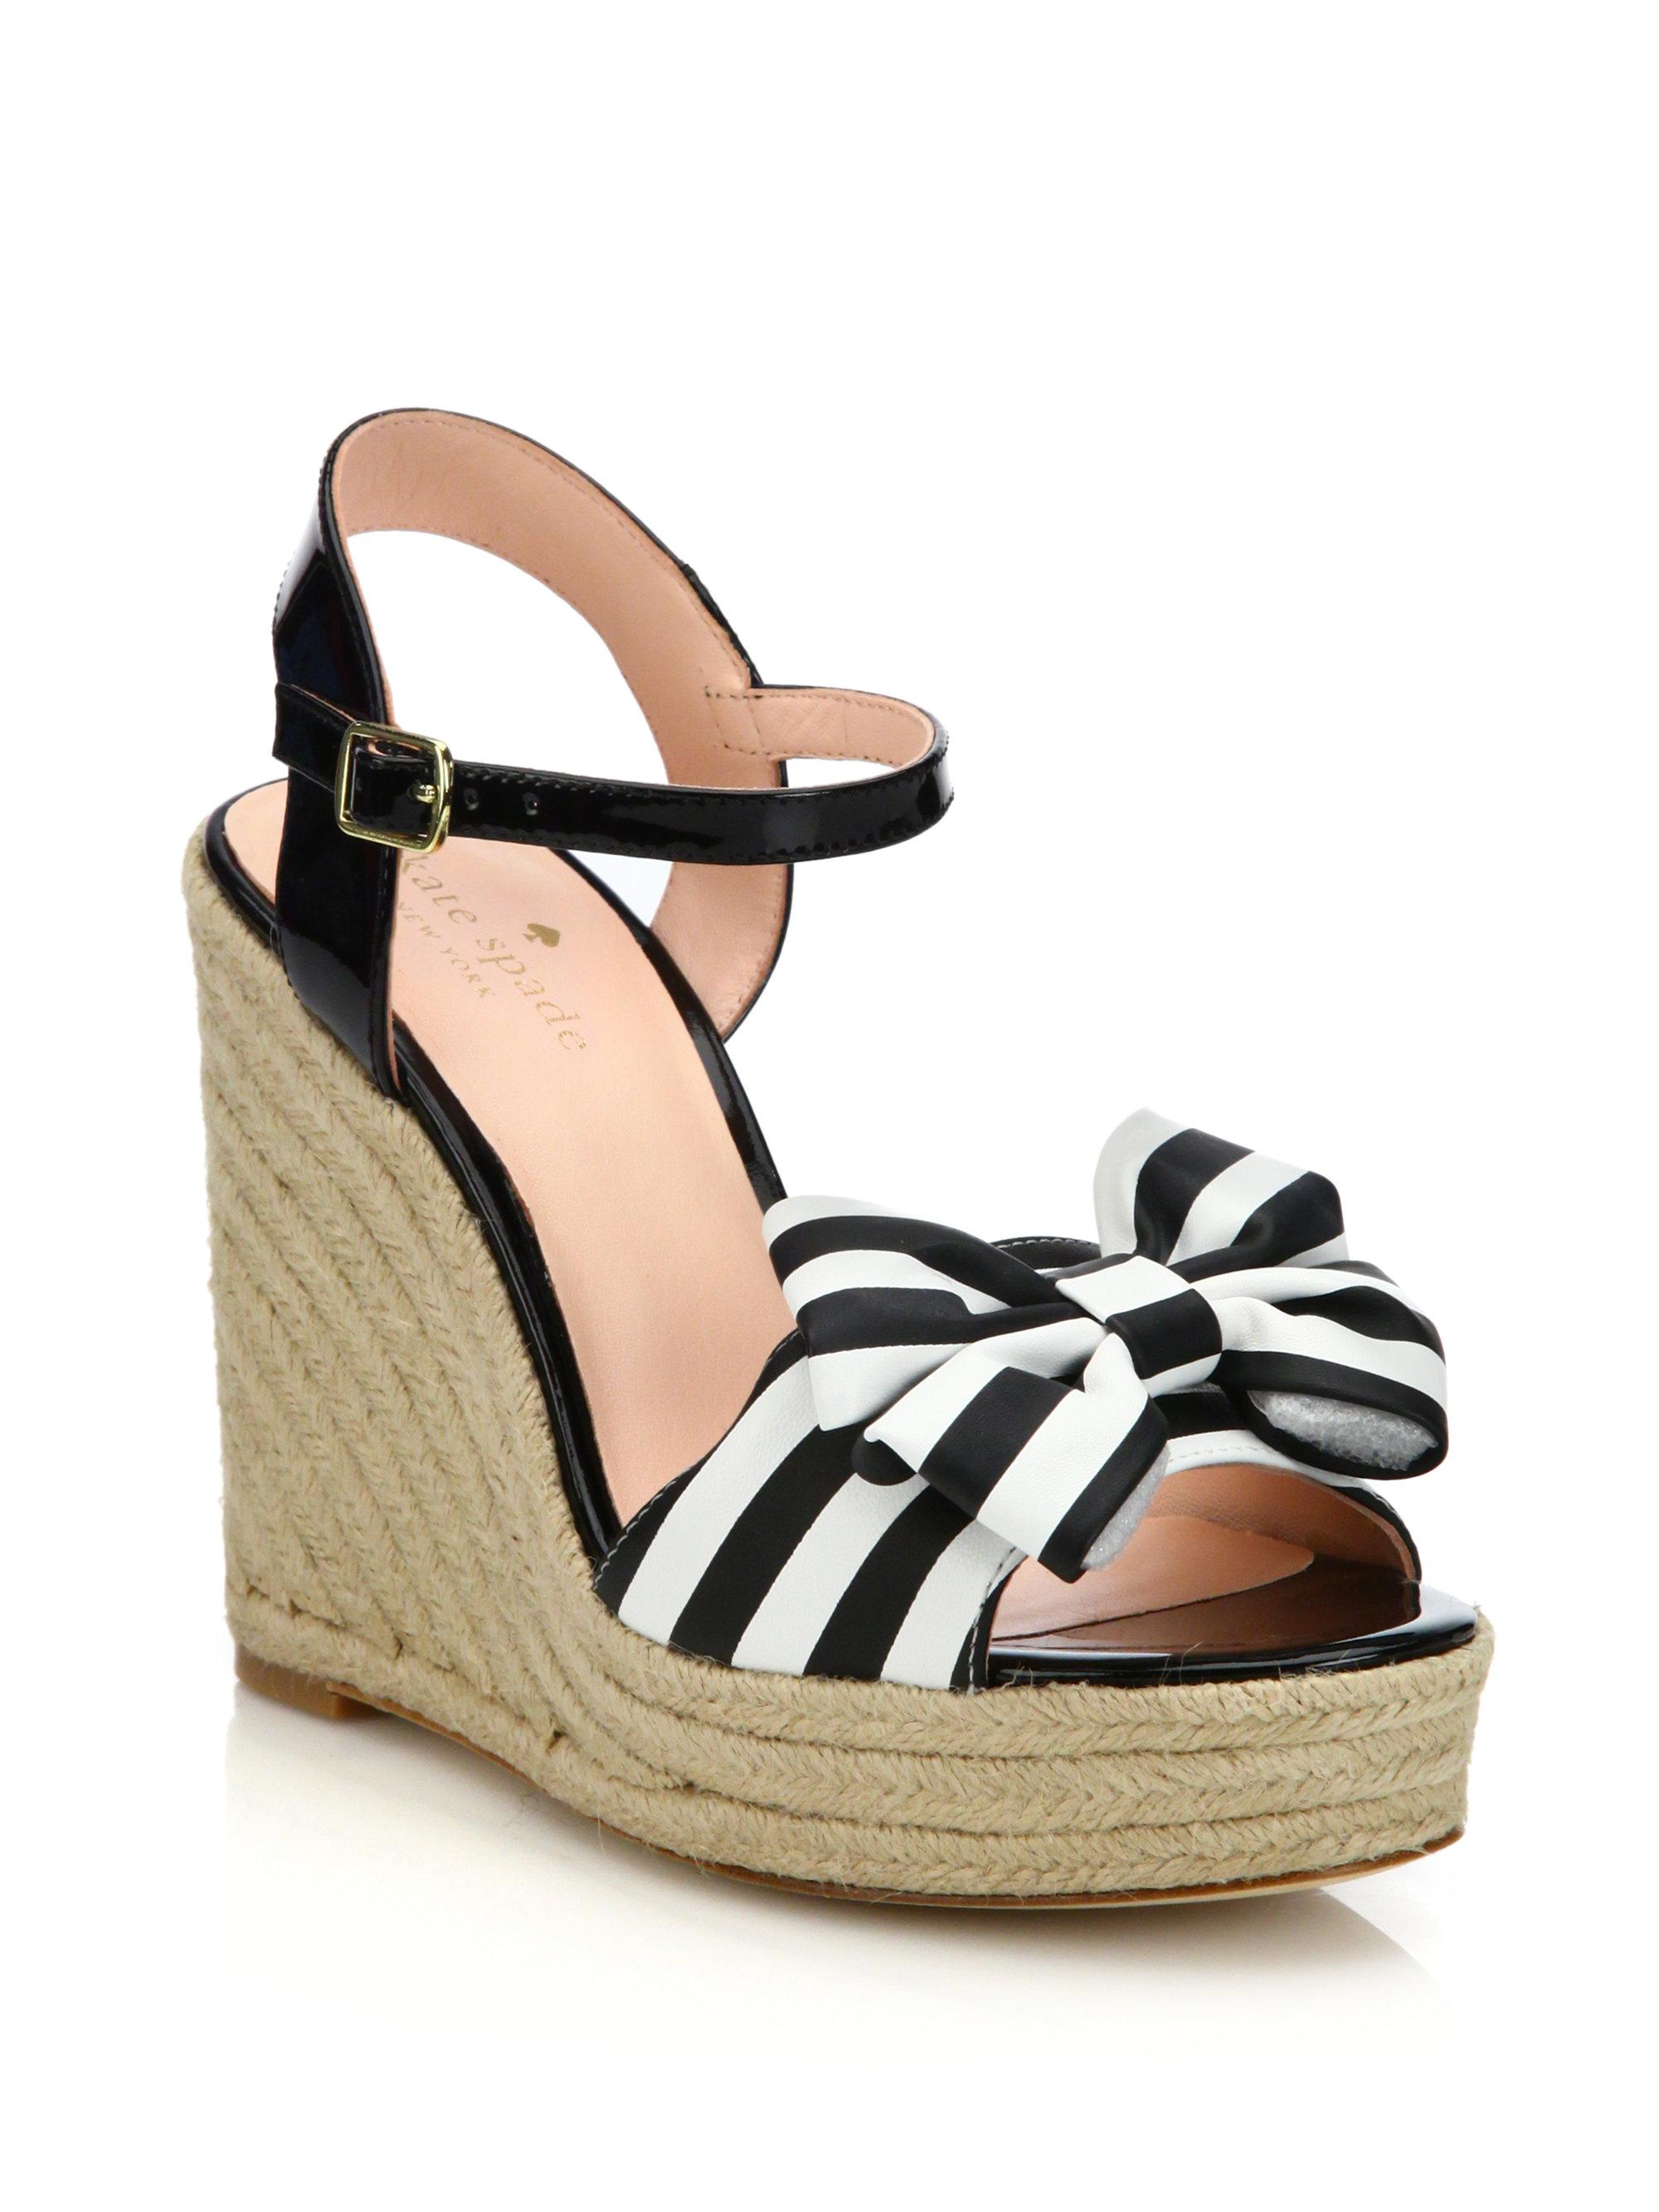 6e2f1edbd6be Lyst - Kate Spade Darya Espadrille Wedge Sandals in Black